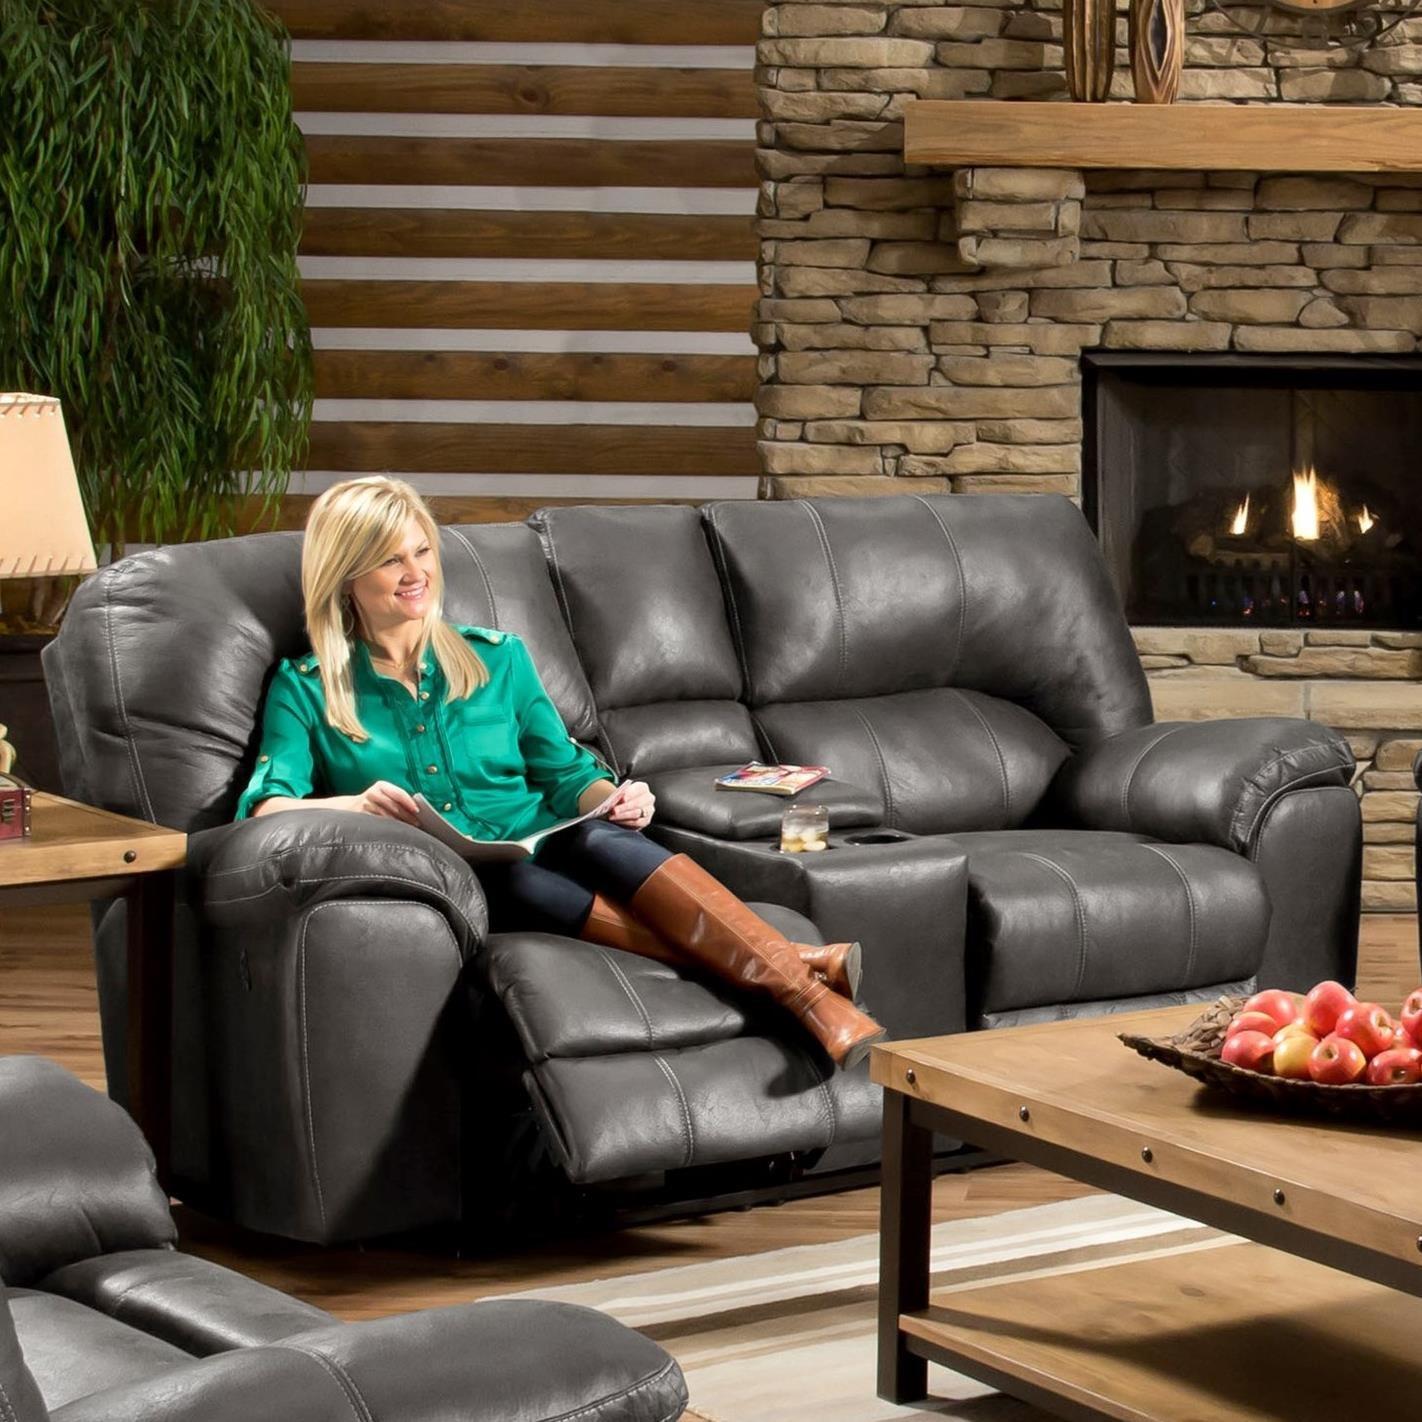 AF740 Reclining Loveseat by Peak Living at Smart Buy Furniture